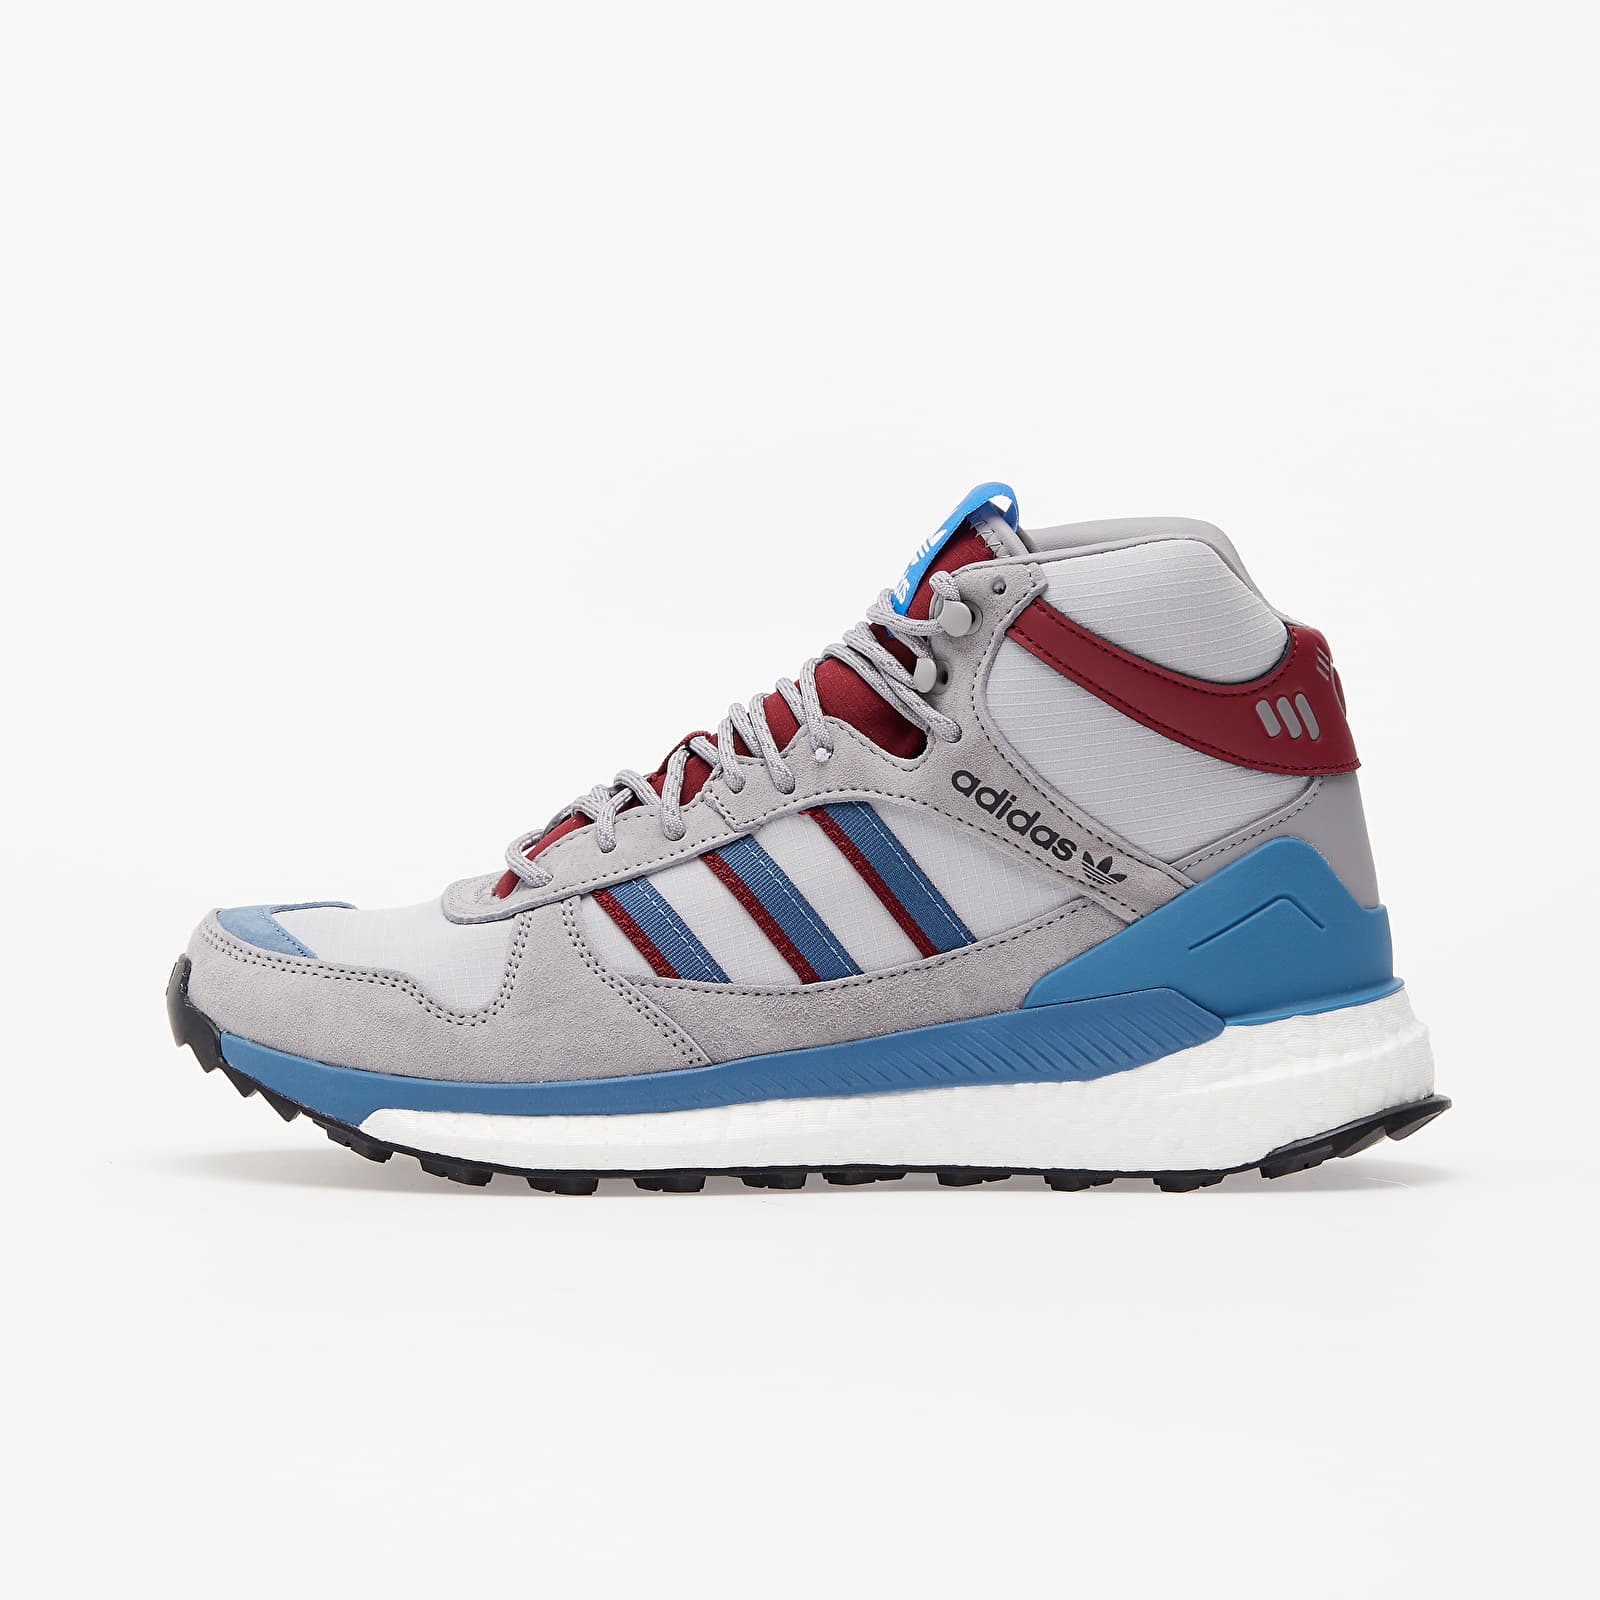 adidas Marathon Human Made Clear Onix/ St Stonewash Blue/ Collegiate Burgundy FY9149